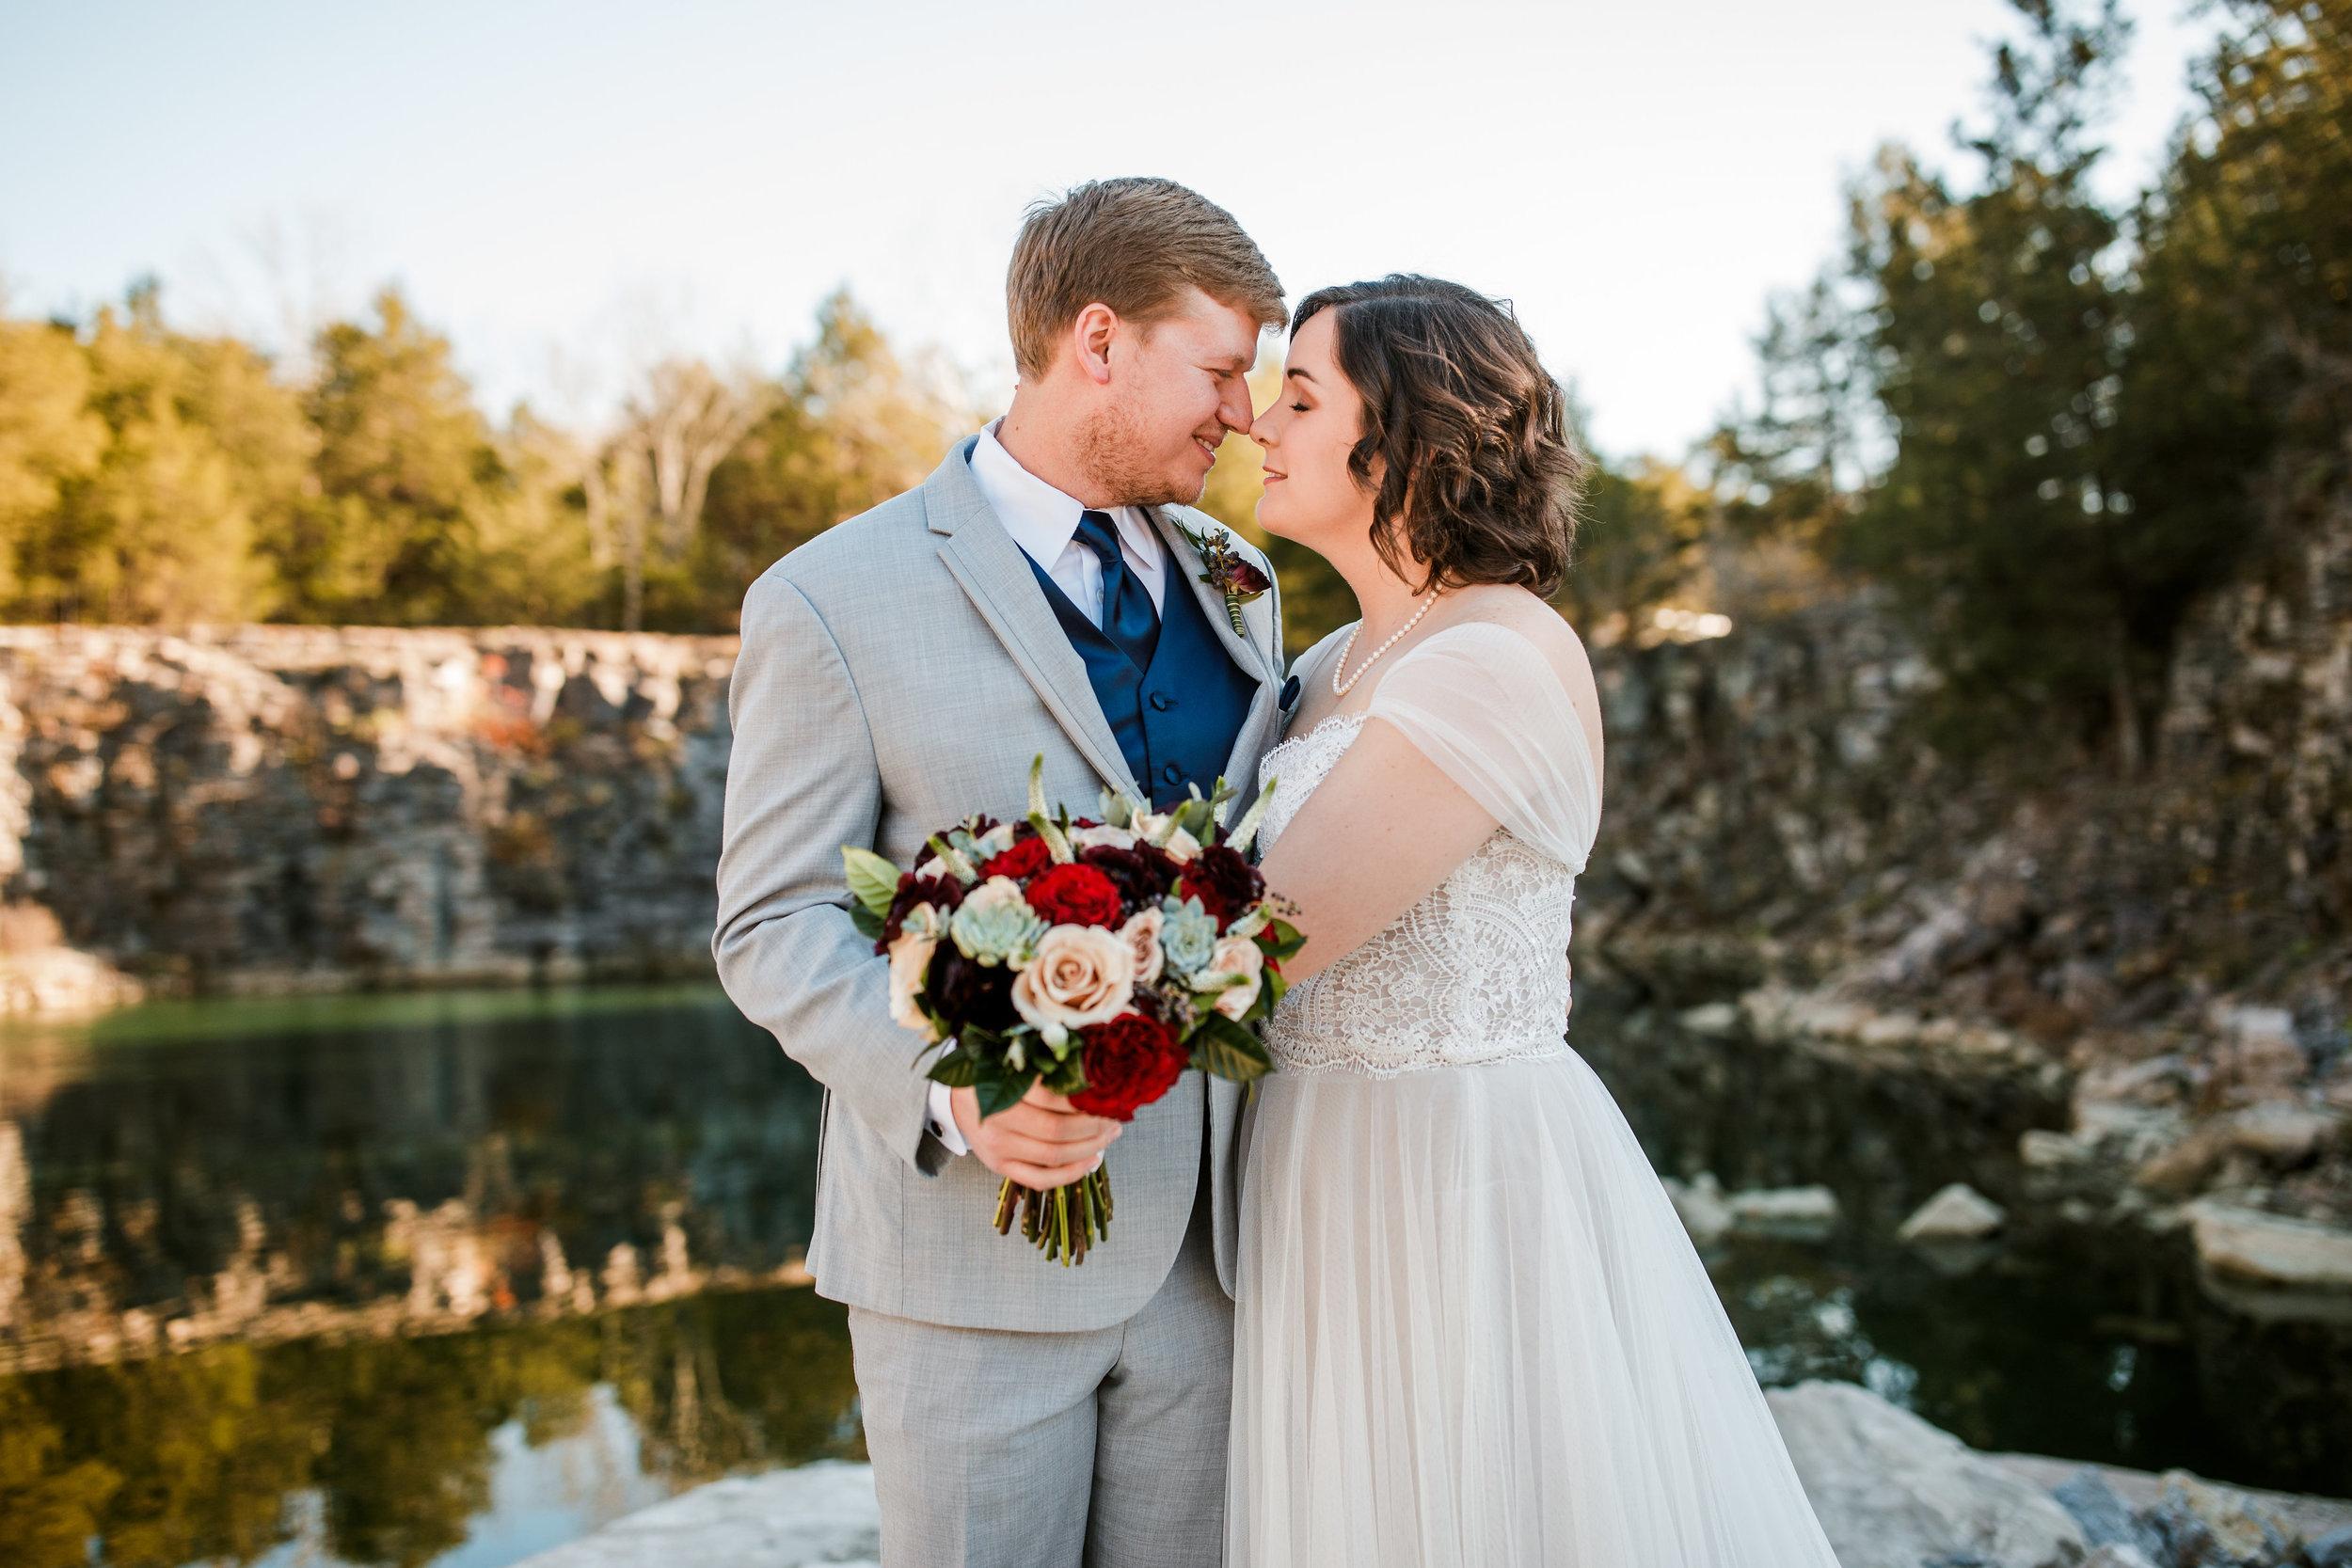 Graystone-Quarry-Wedding 24.jpg